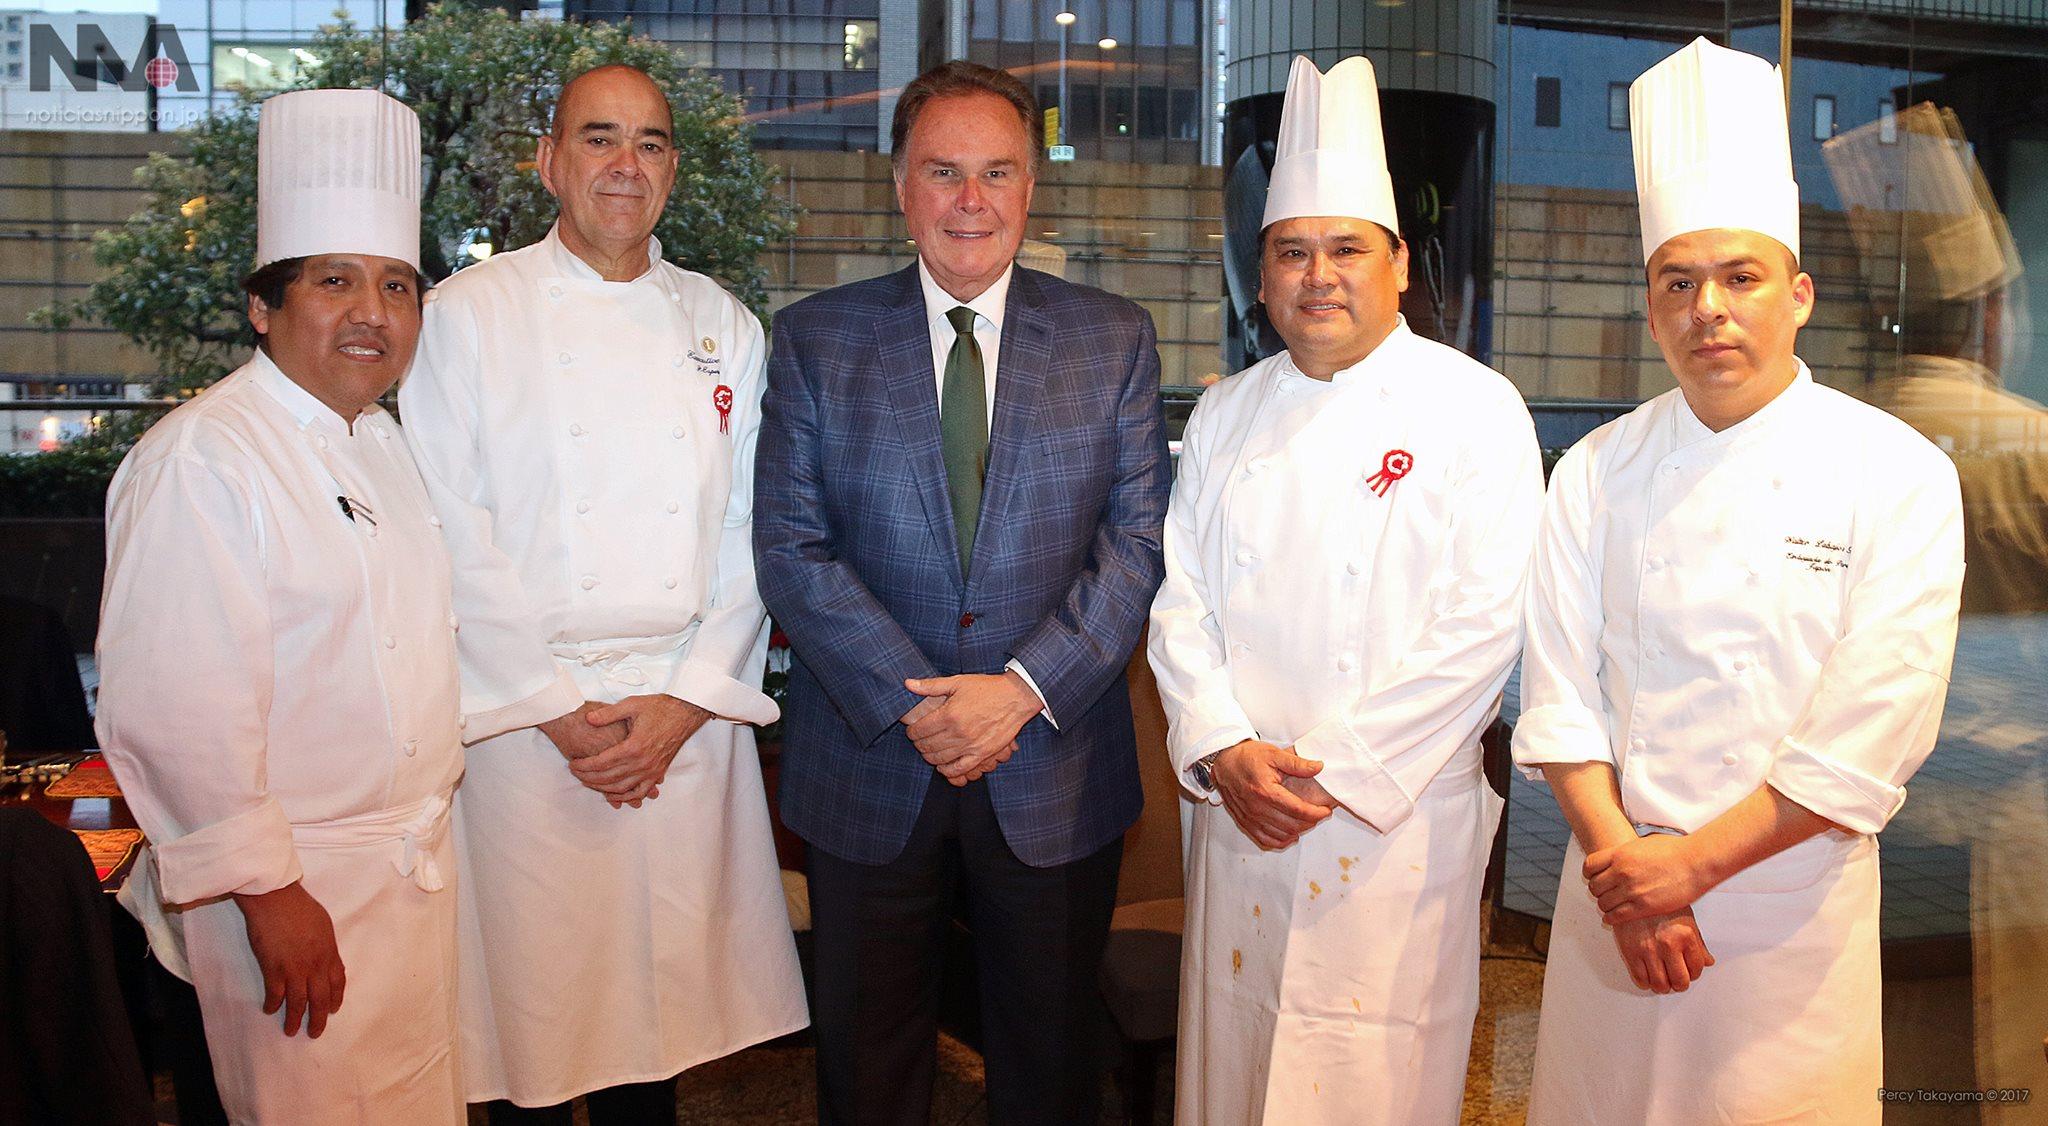 ANAインターコンチネンタルホテル東京にて、南米ペルー料理ブッフェ開催